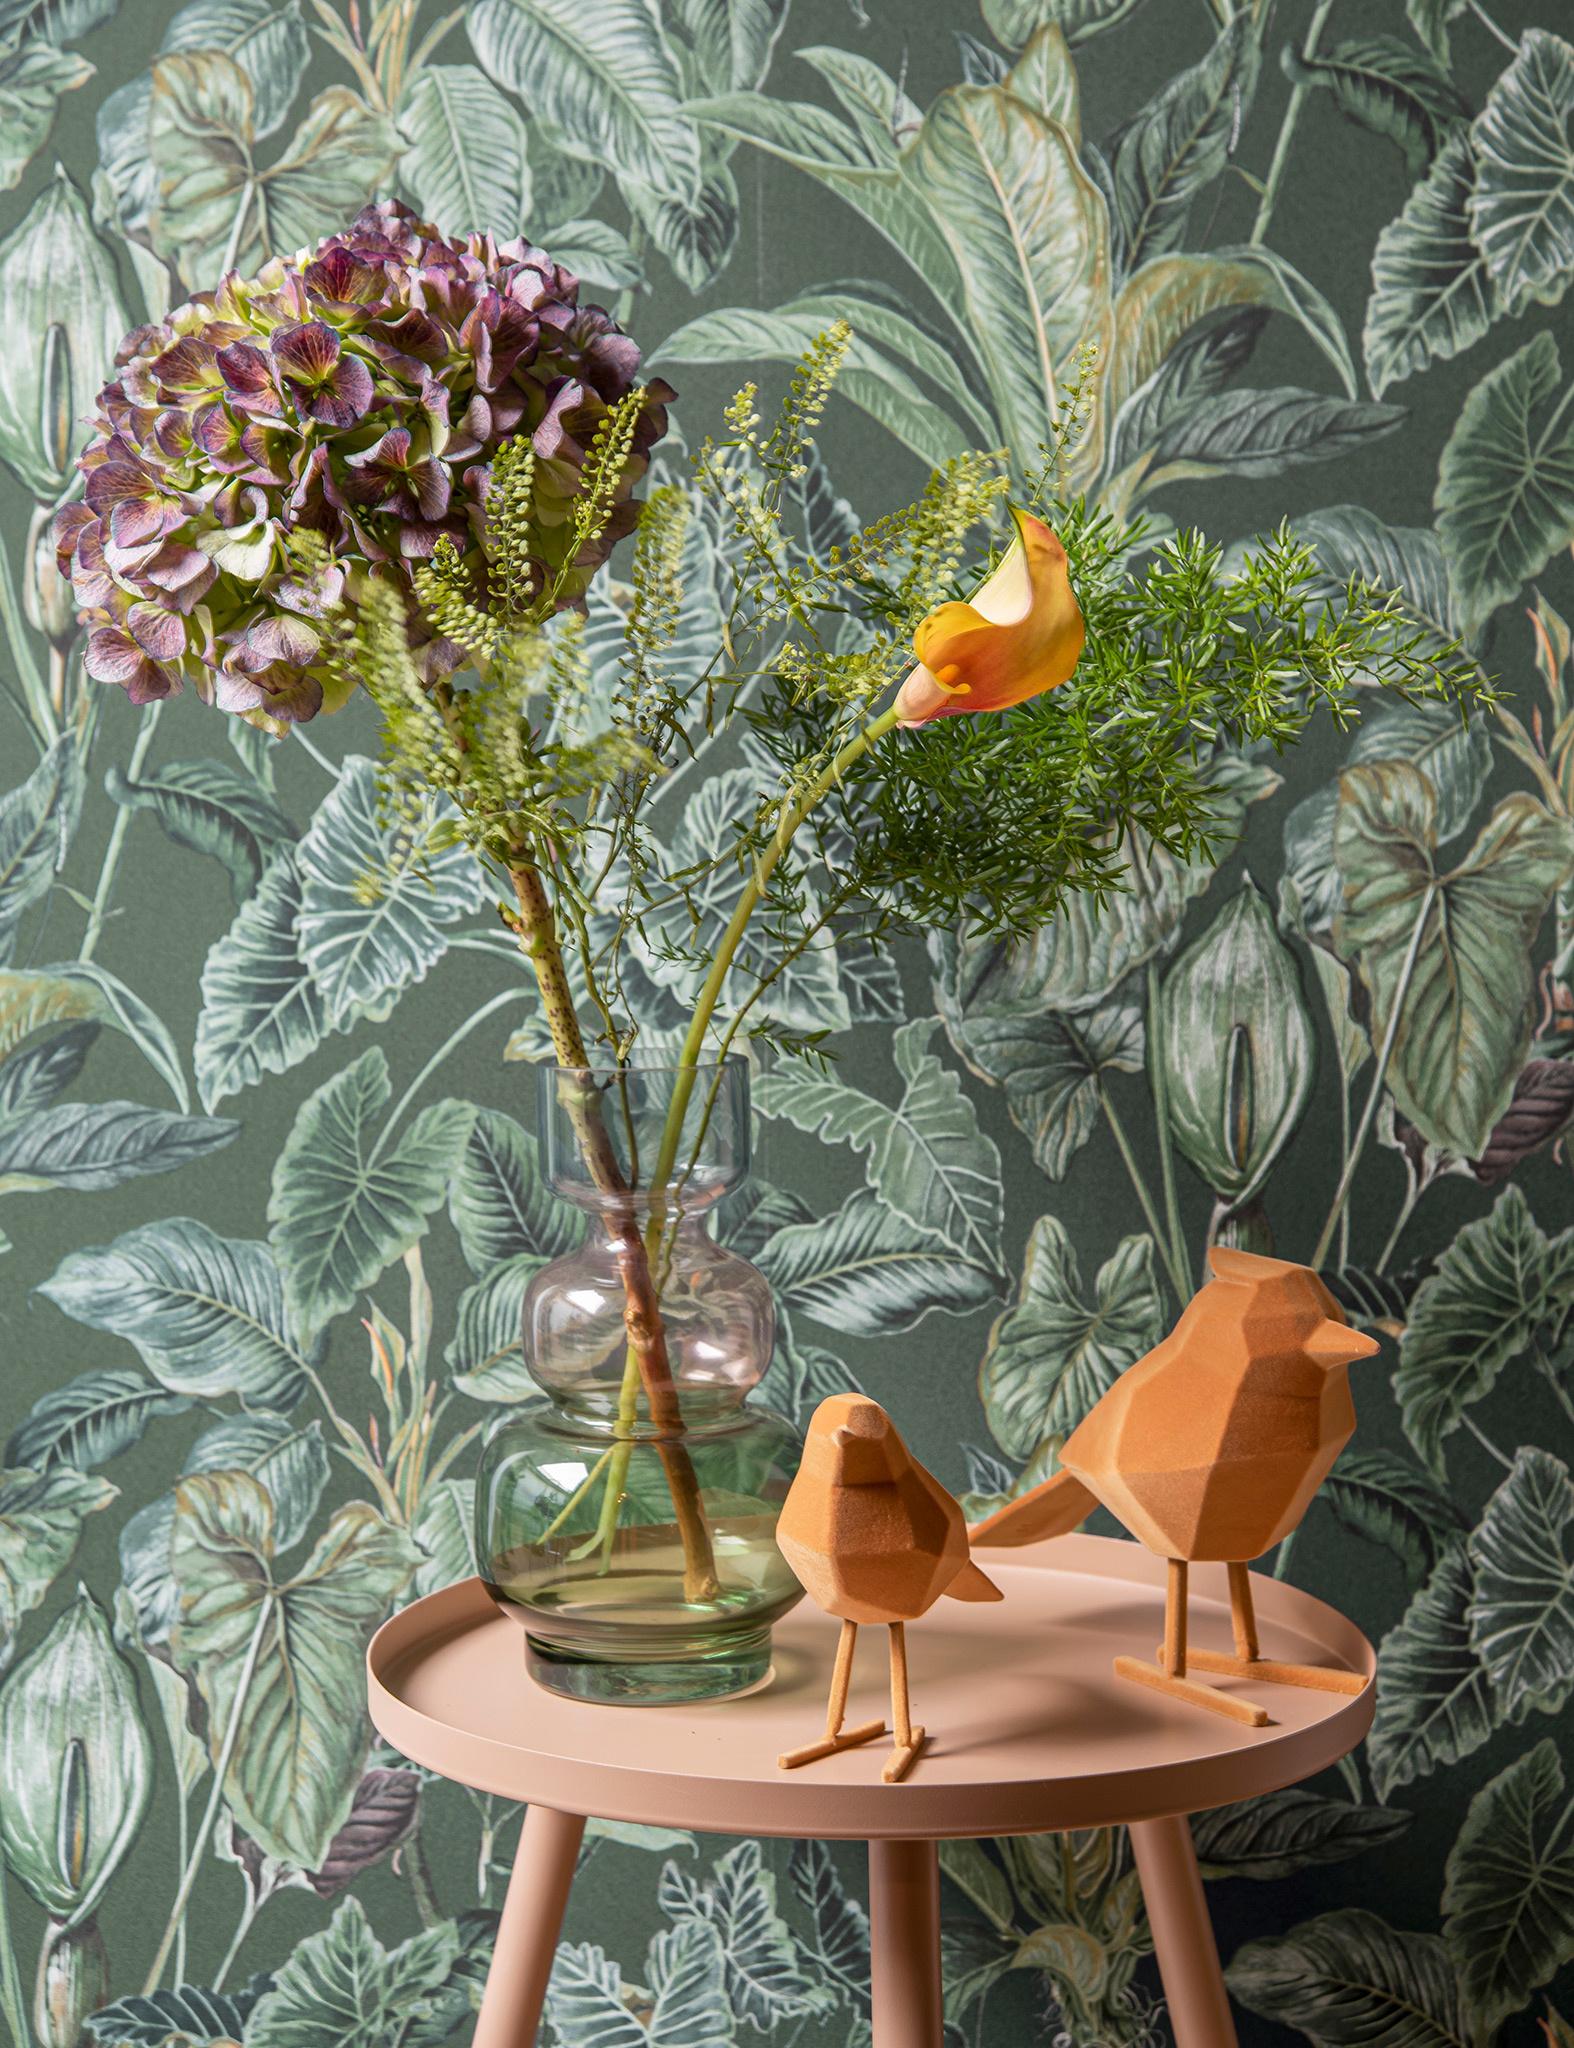 Oranjegele origami vogels van Present time